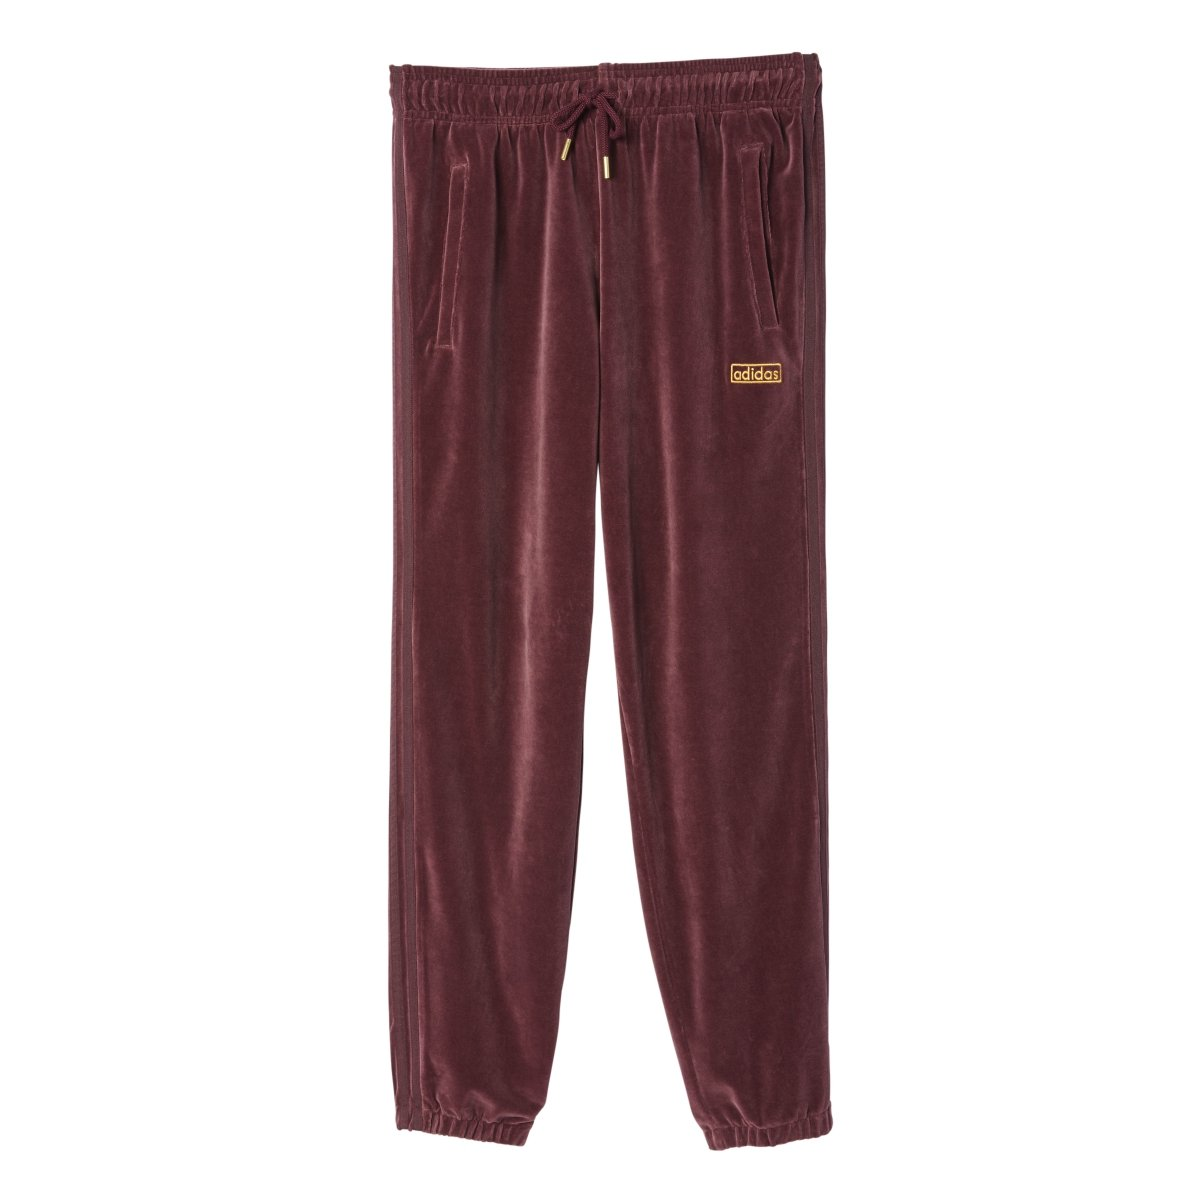 adidas Originals - Pantalón de chándal para Hombre Granate ay9231 ...